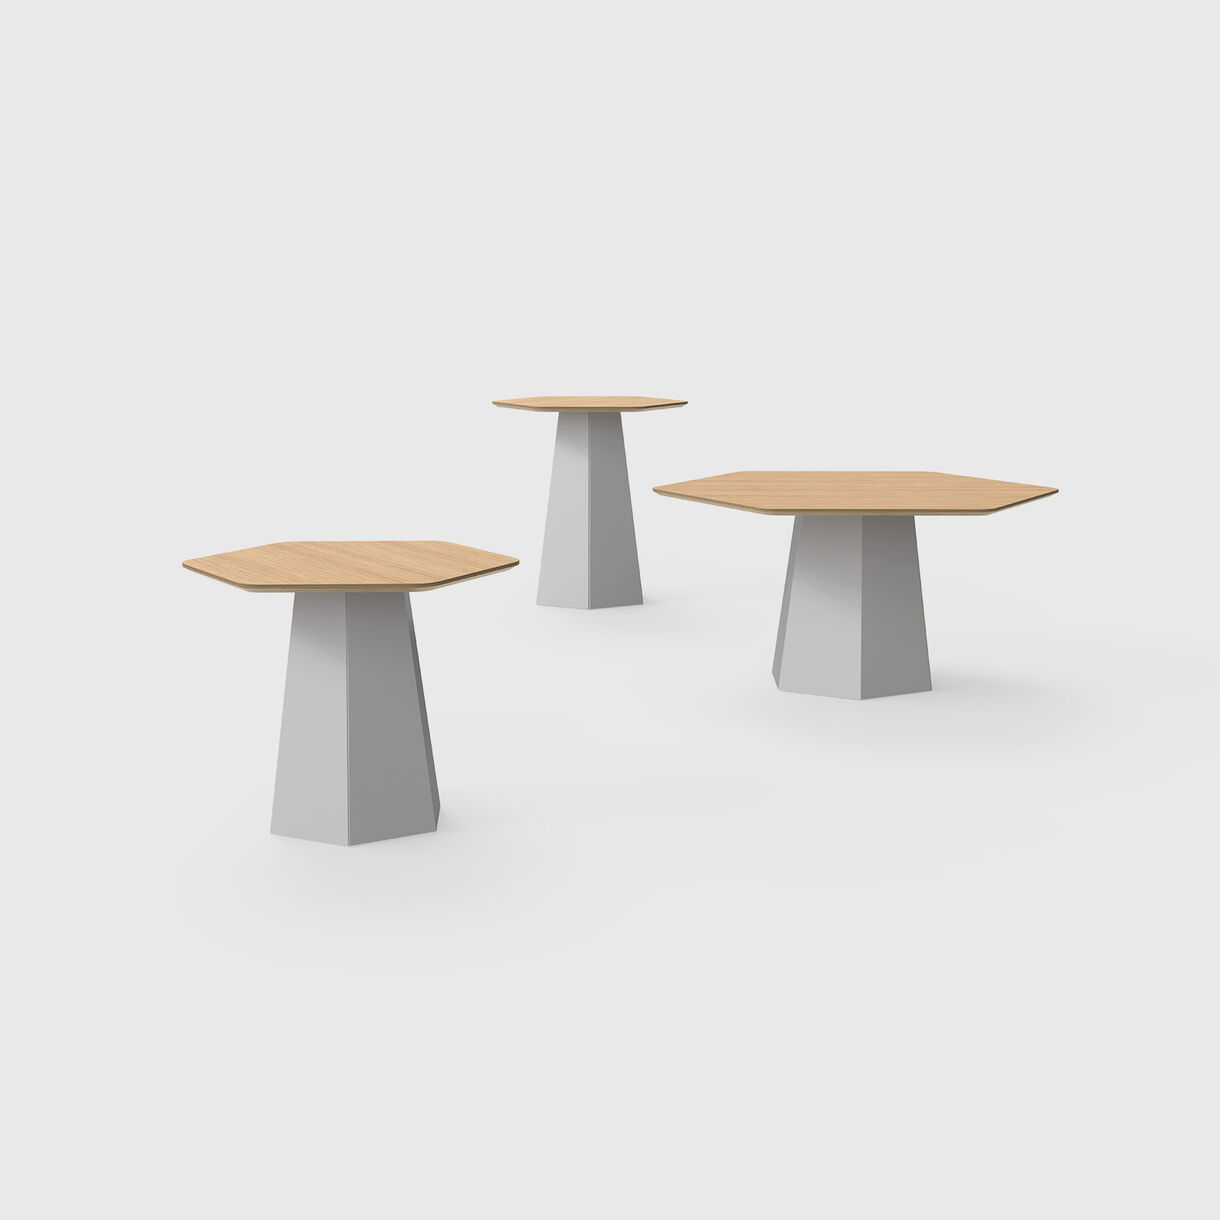 Hext Tables, Group